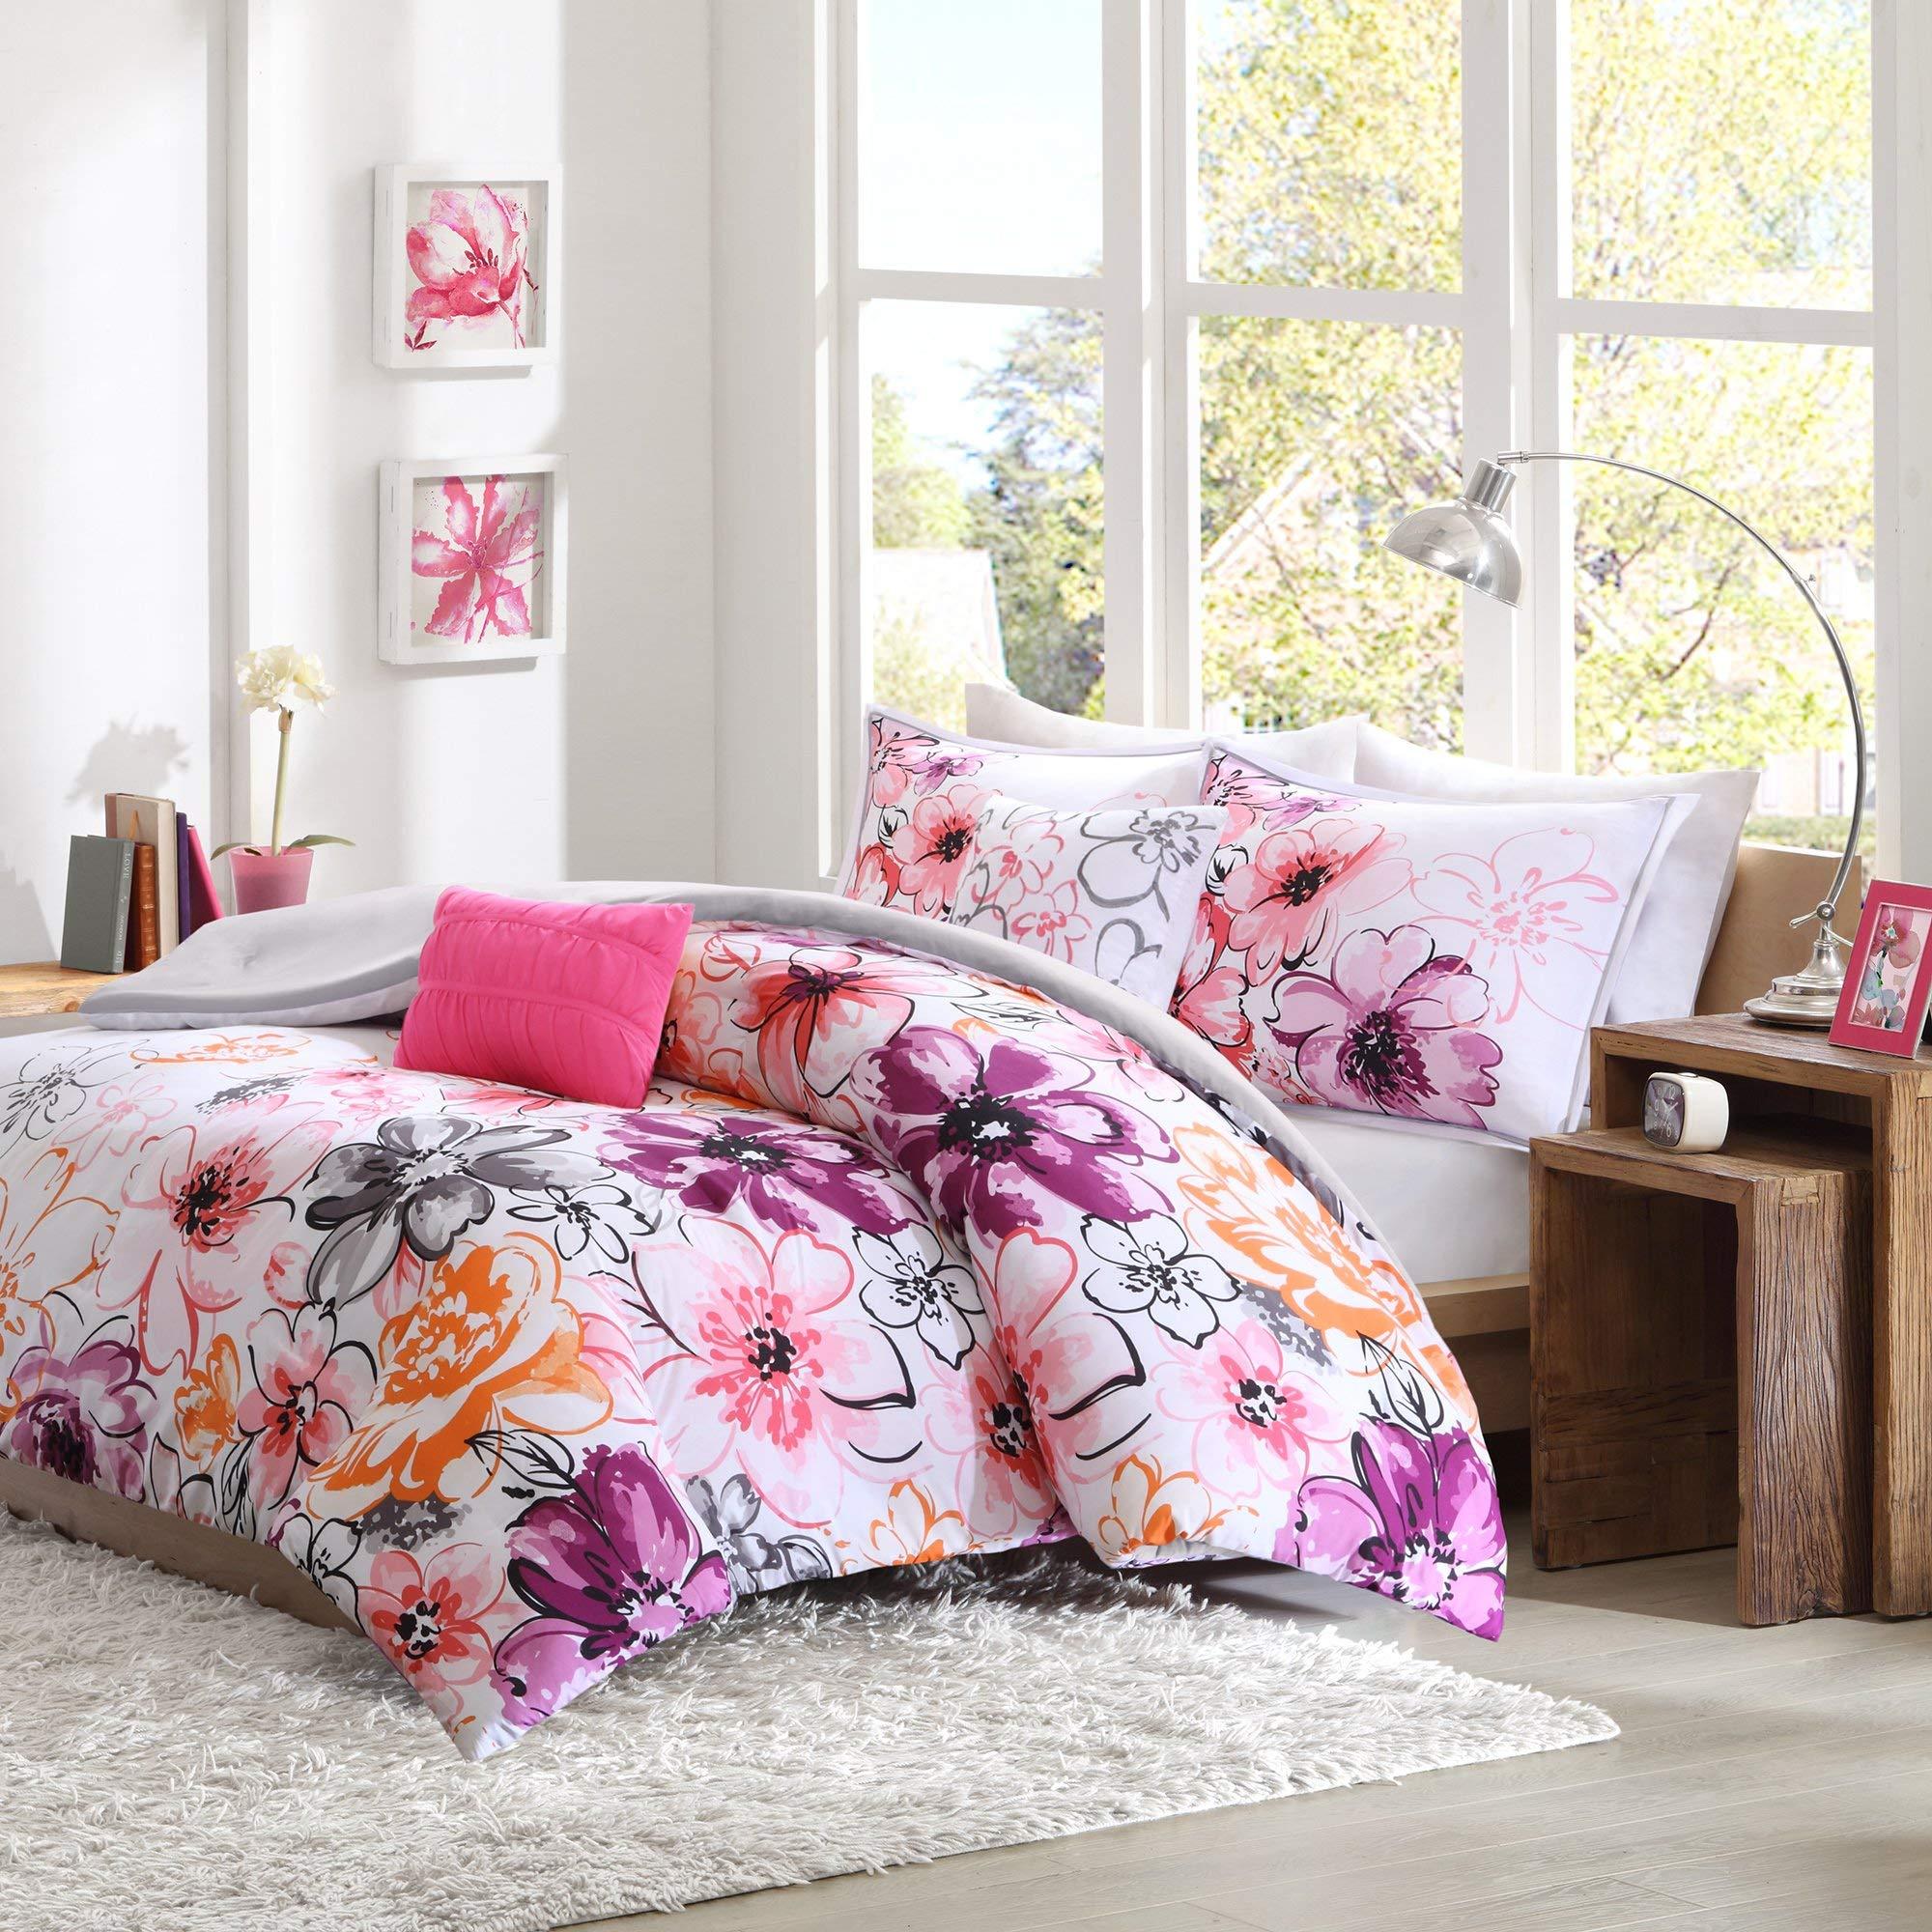 Intelligent Design Olivia Comforter Set Twin/Twin XL Size - Purple Pink, Floral – 4 Piece Bed Sets – Ultra Soft Microfiber Teen Bedding for Girls Bedroom